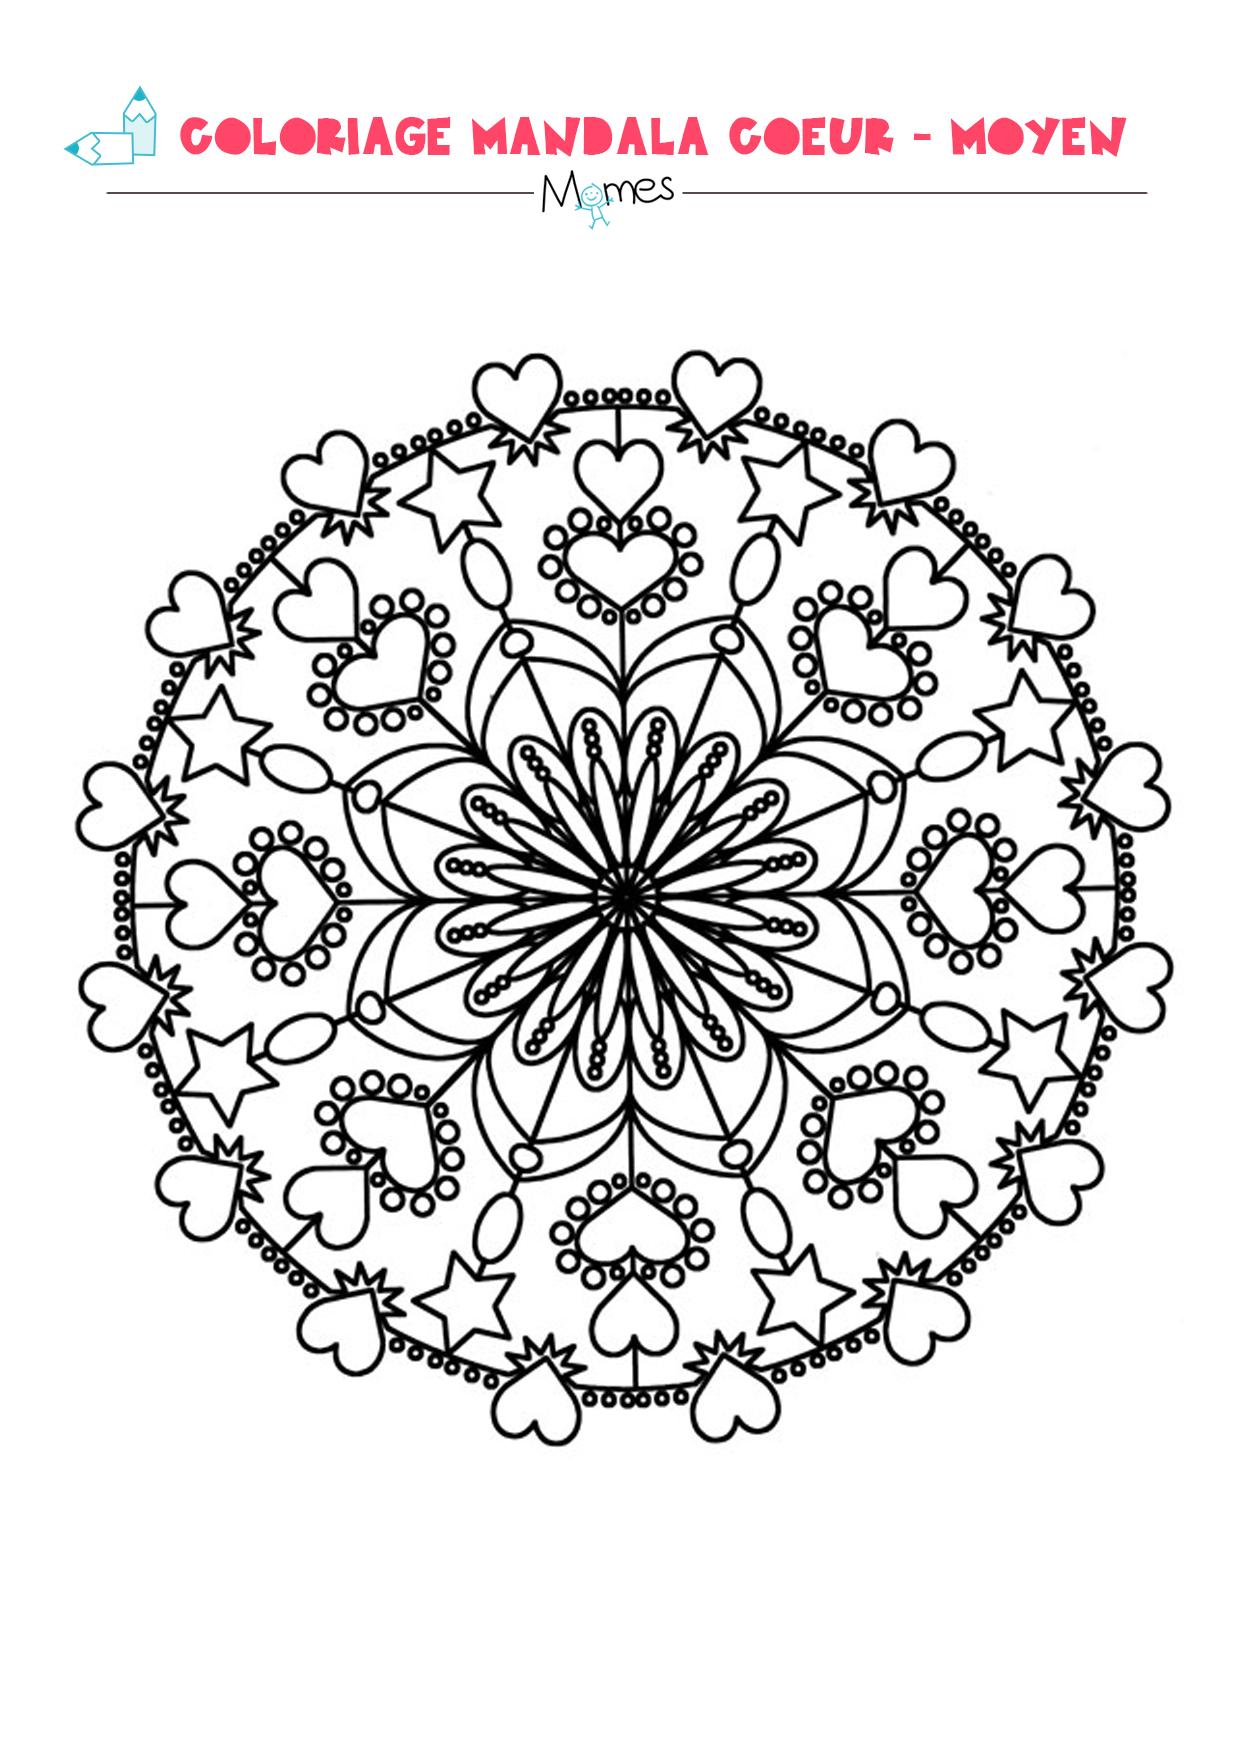 Coloriage Coeur Motif.Mandala Coeur A Colorier Moyen Momes Net